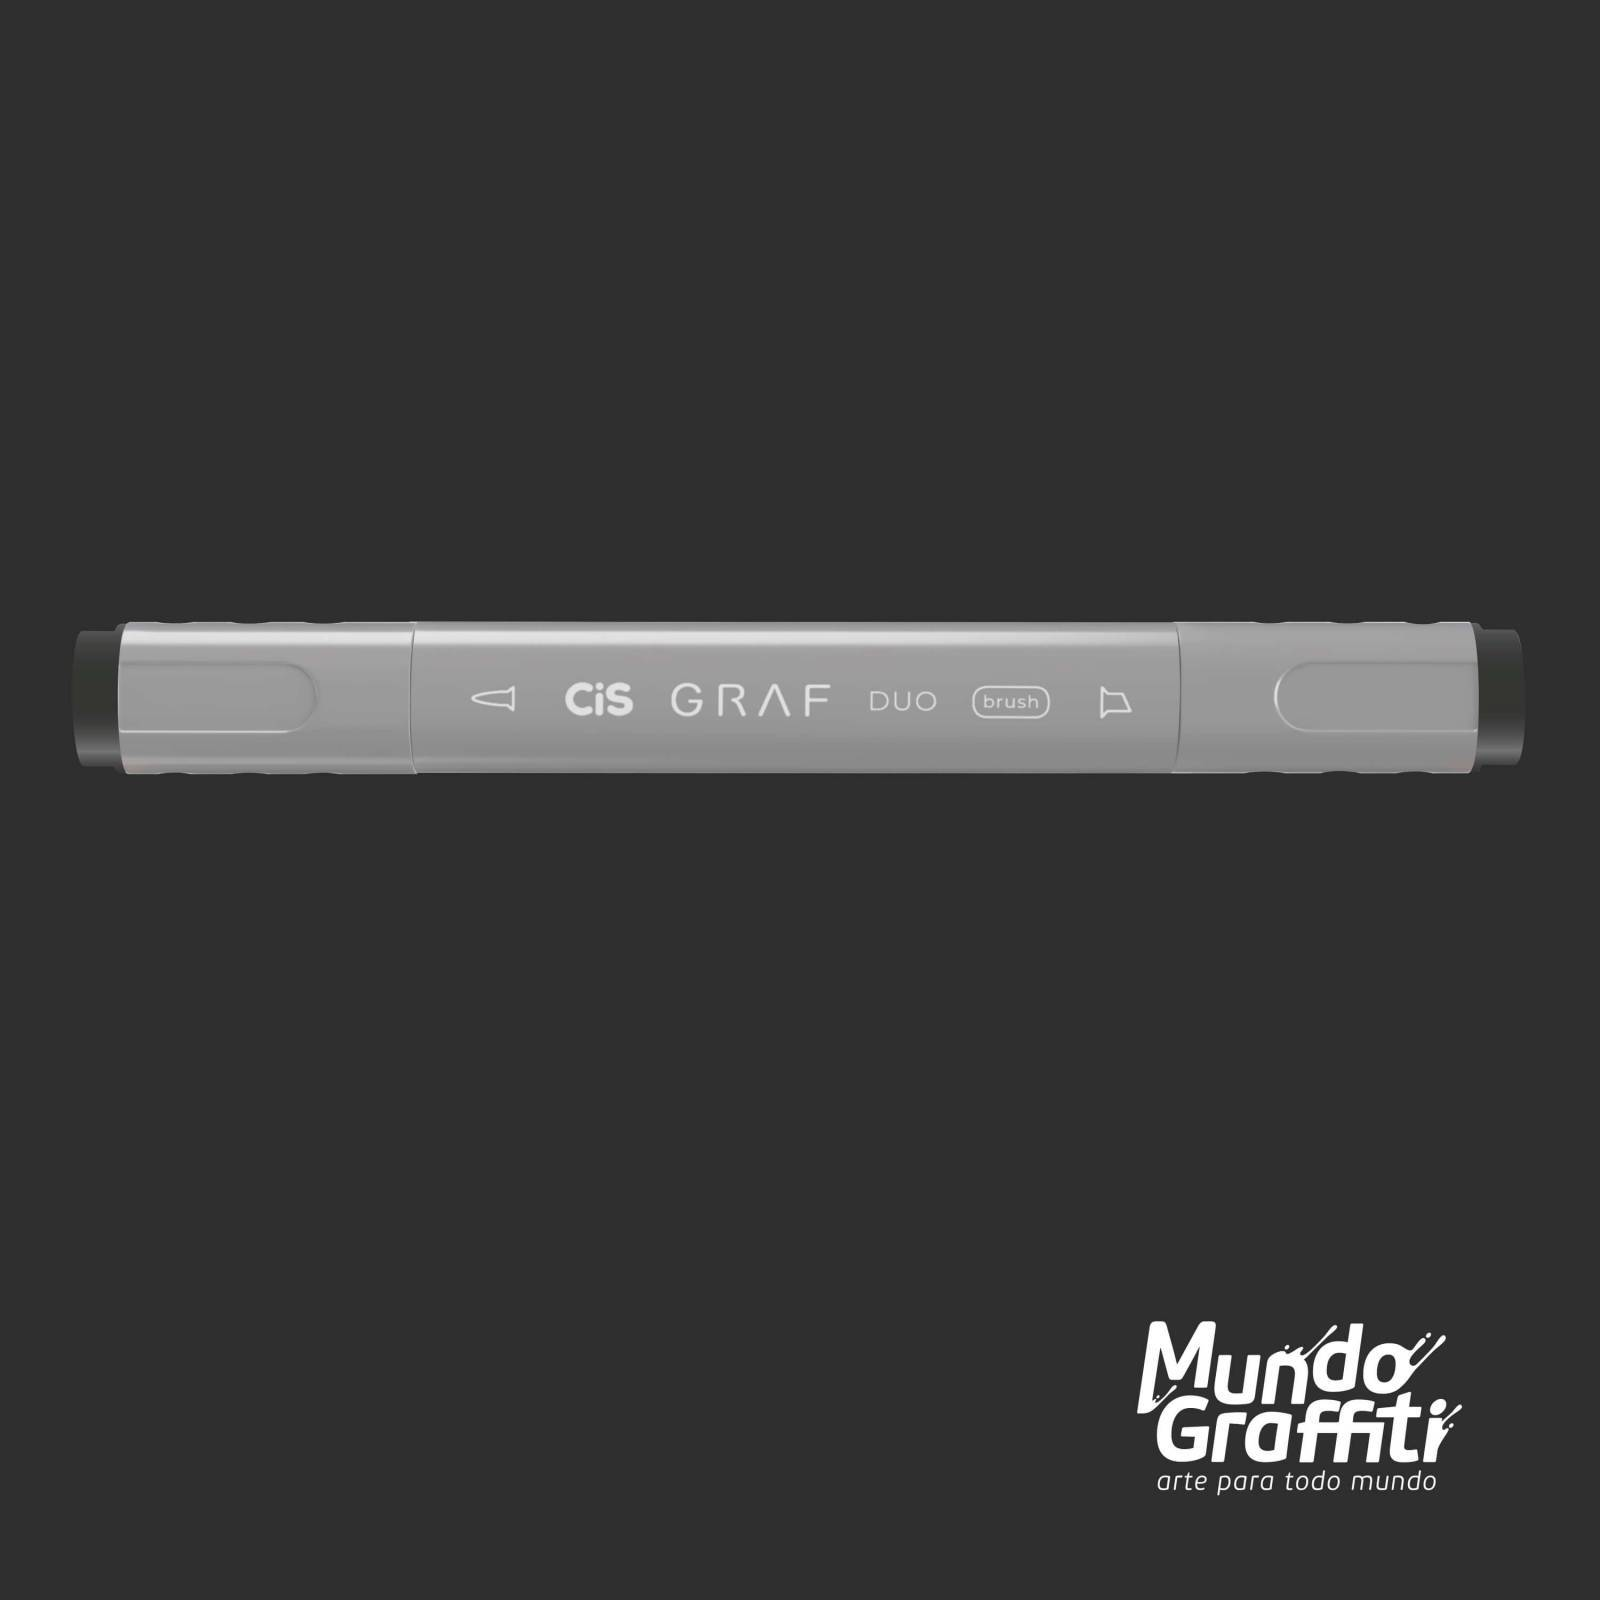 Marcador Cis Graf Duo Brush Cool Grey CG9 - Mundo Graffiti